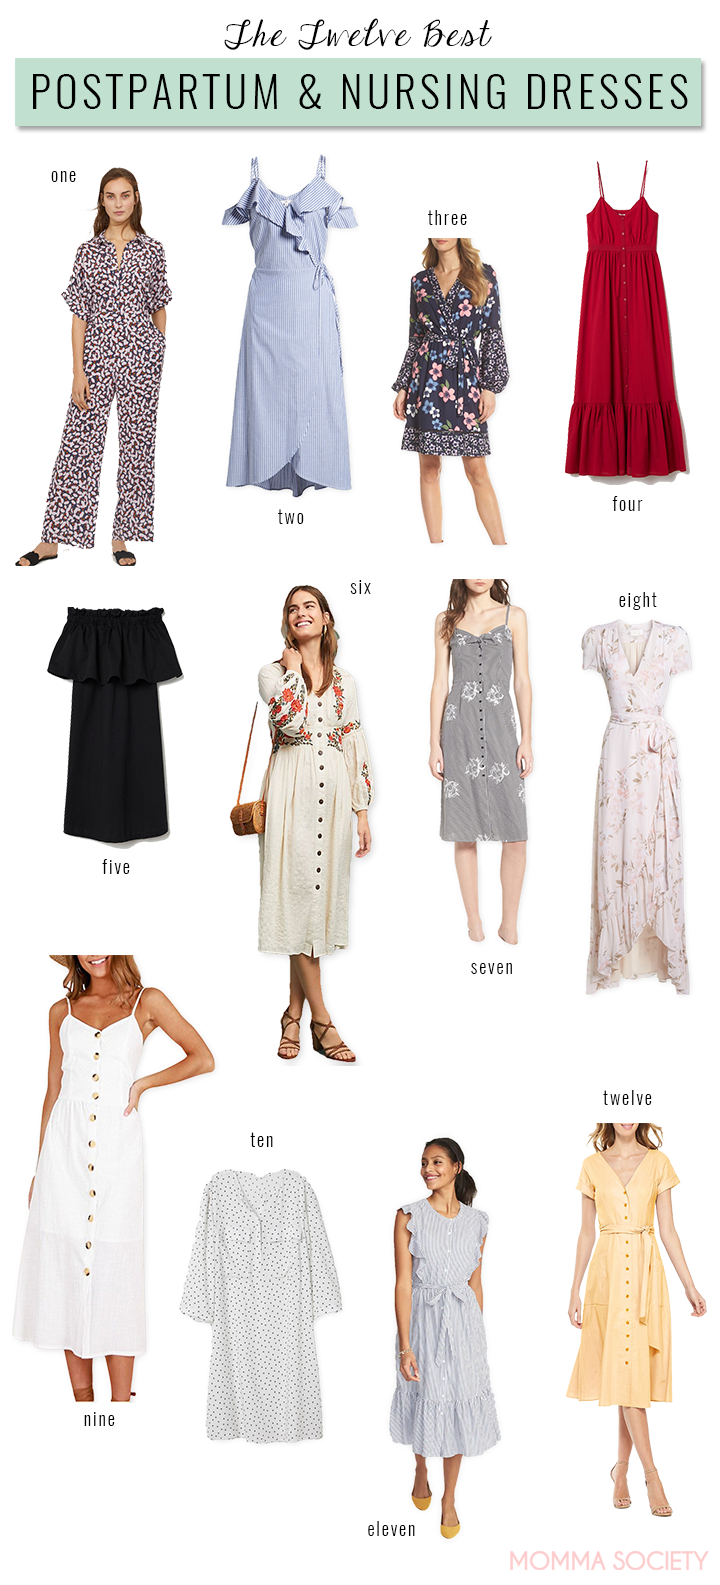 Best Nursing and Postpartum Dresses